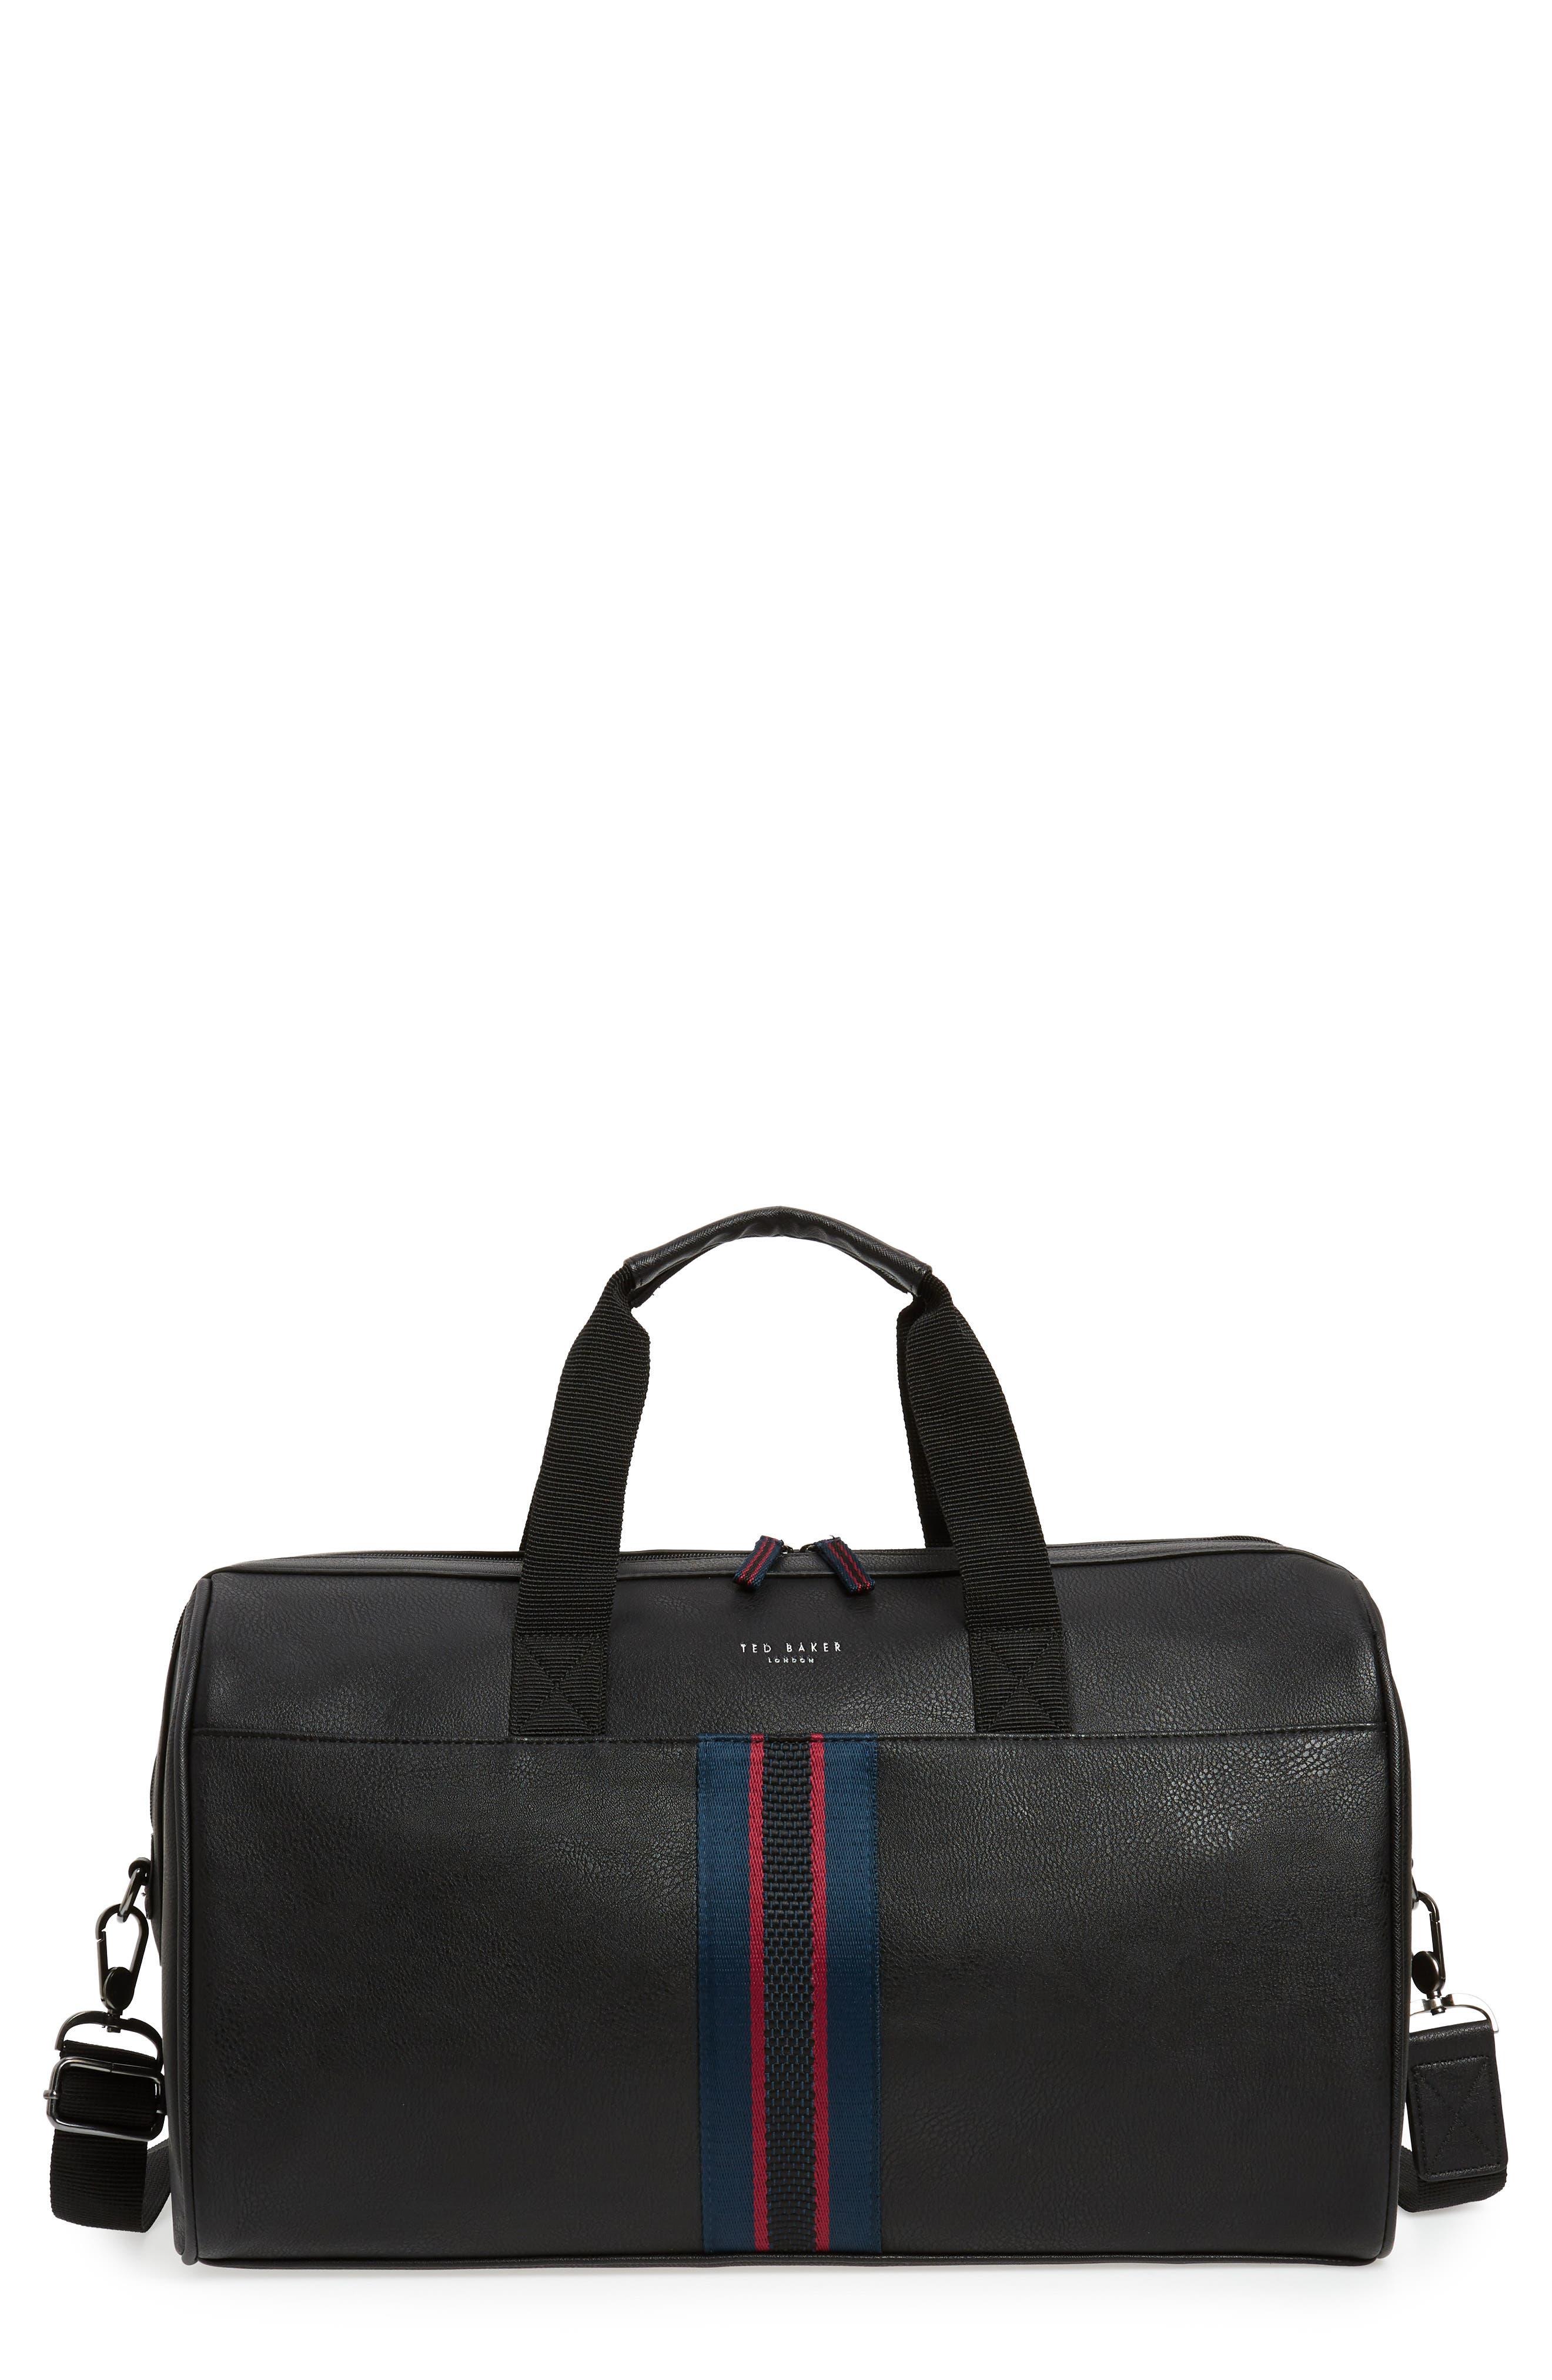 Webbing Duffel Bag,                             Main thumbnail 1, color,                             BLACK